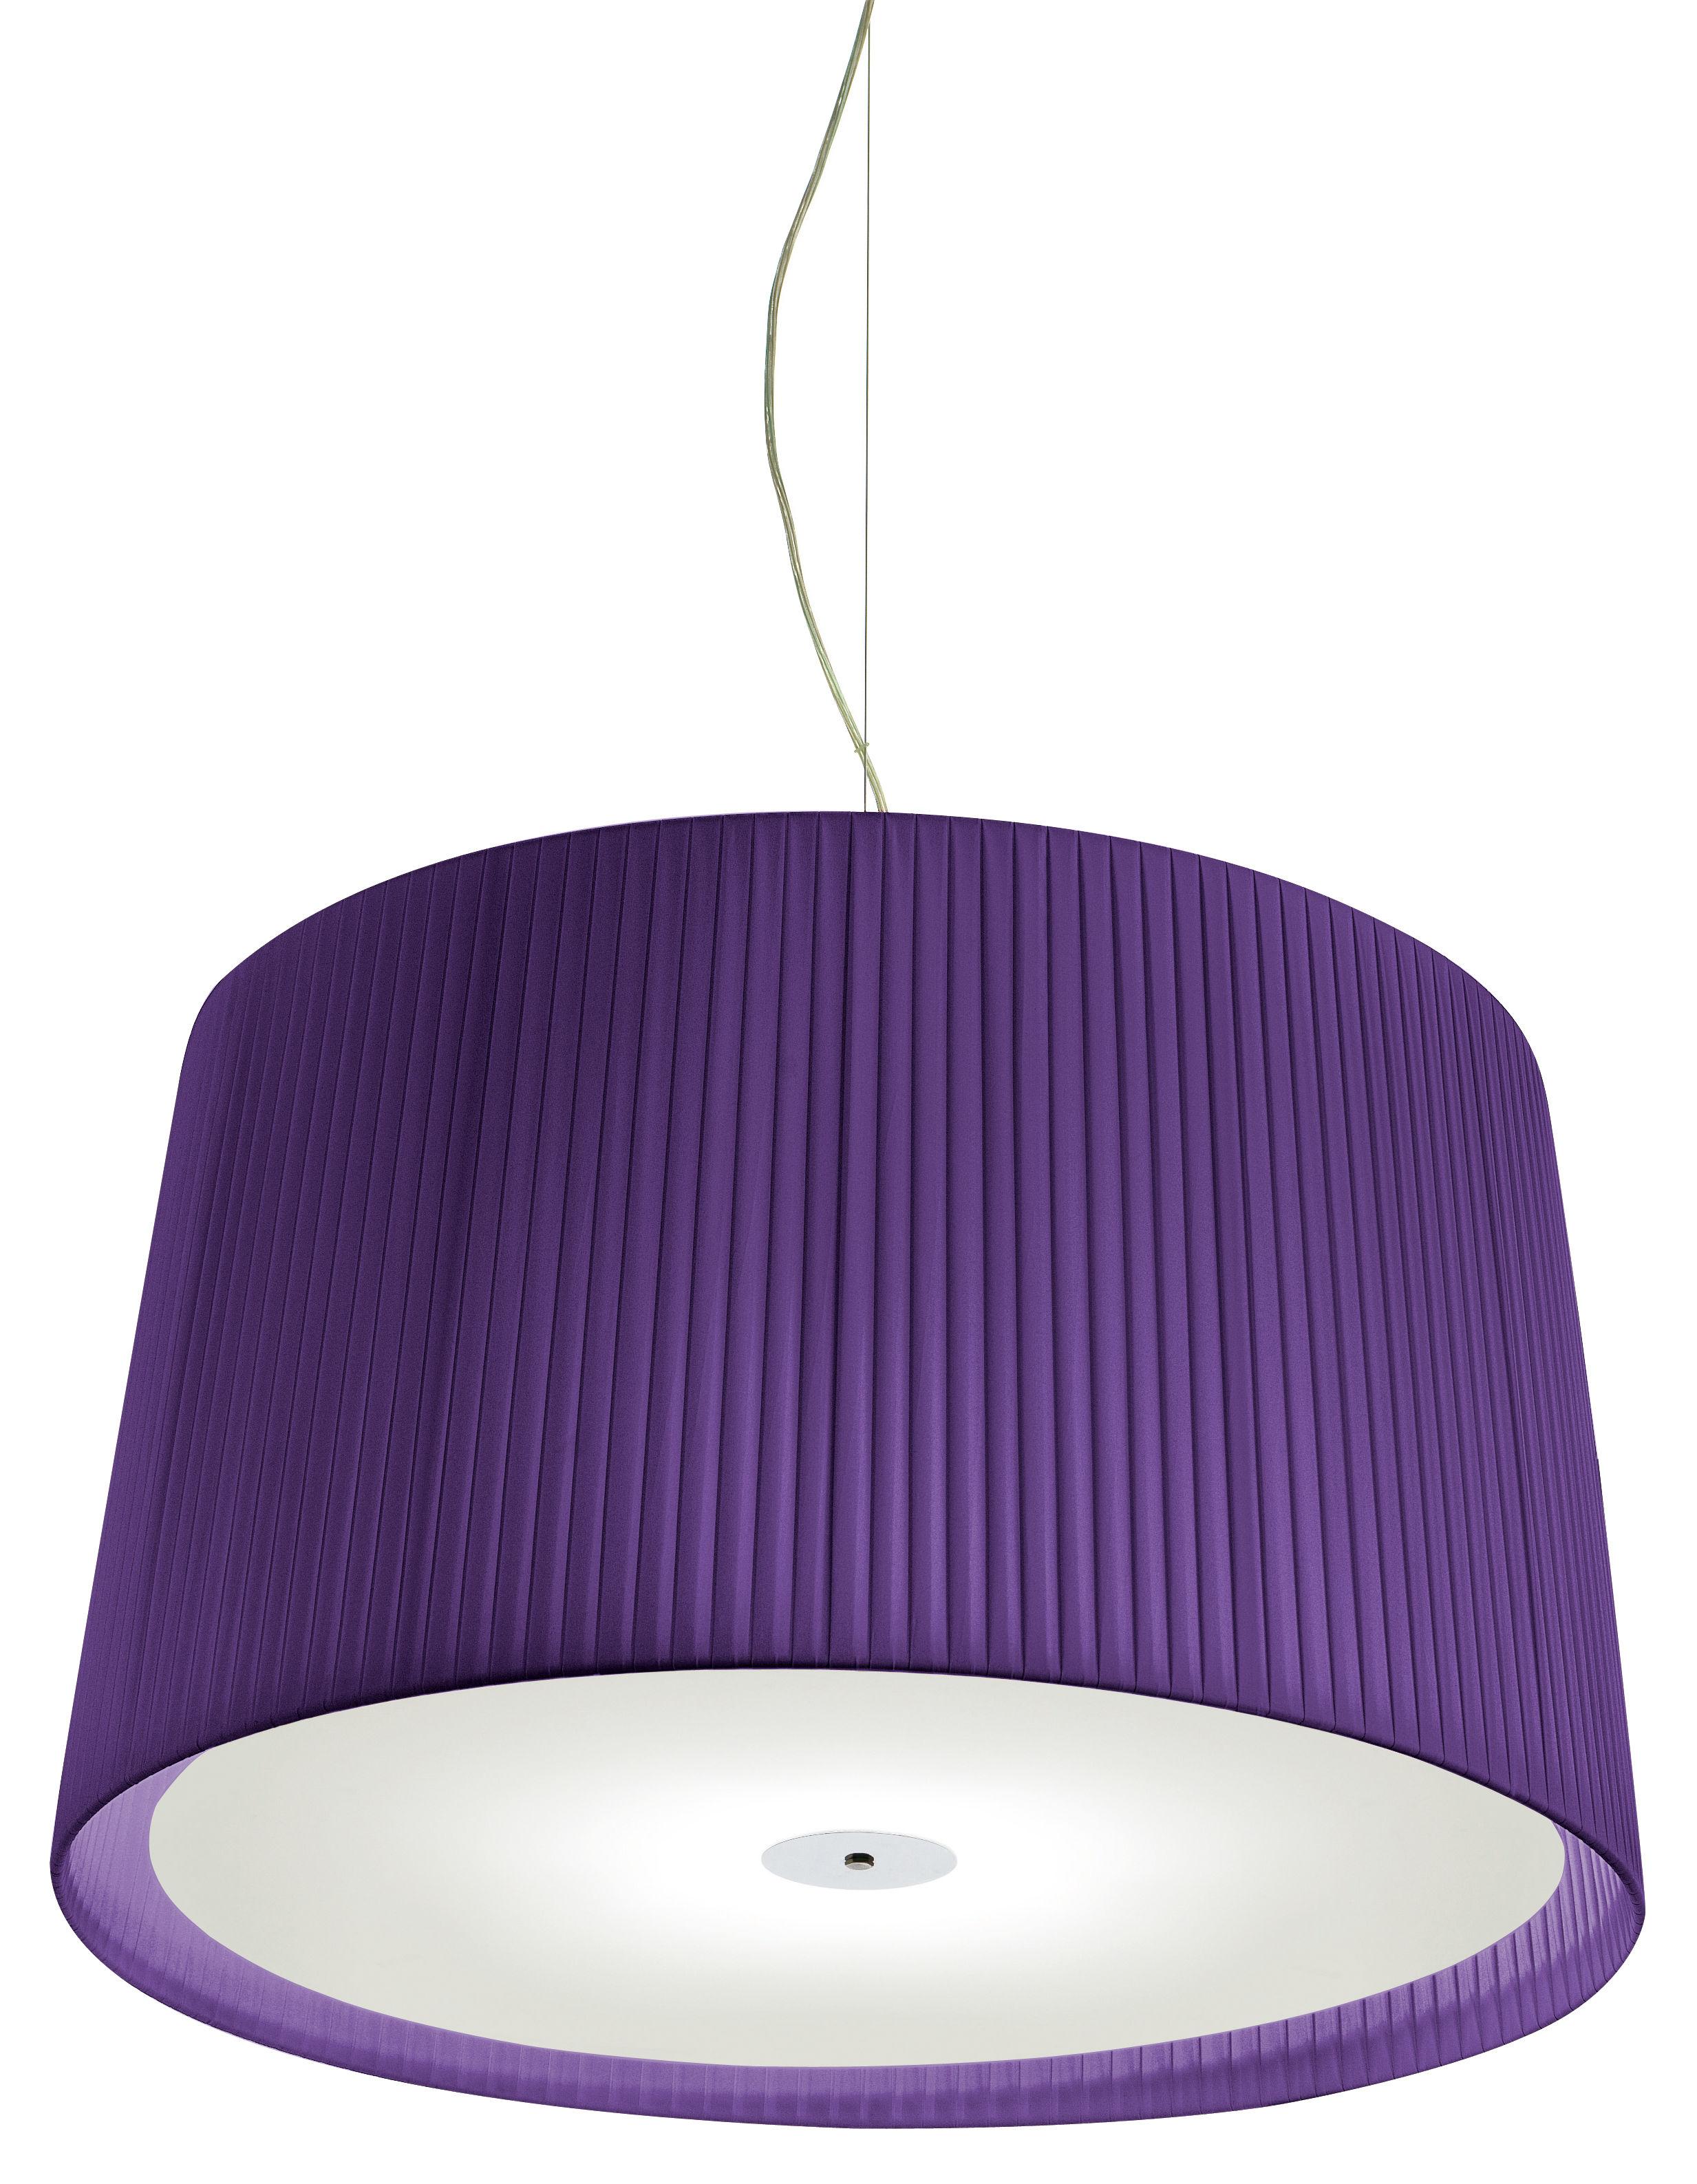 Lighting - Pendant Lighting - Milleluci Pendant - / Ø 80 cm by Modoluce - Purple - Cotton, Plexiglas